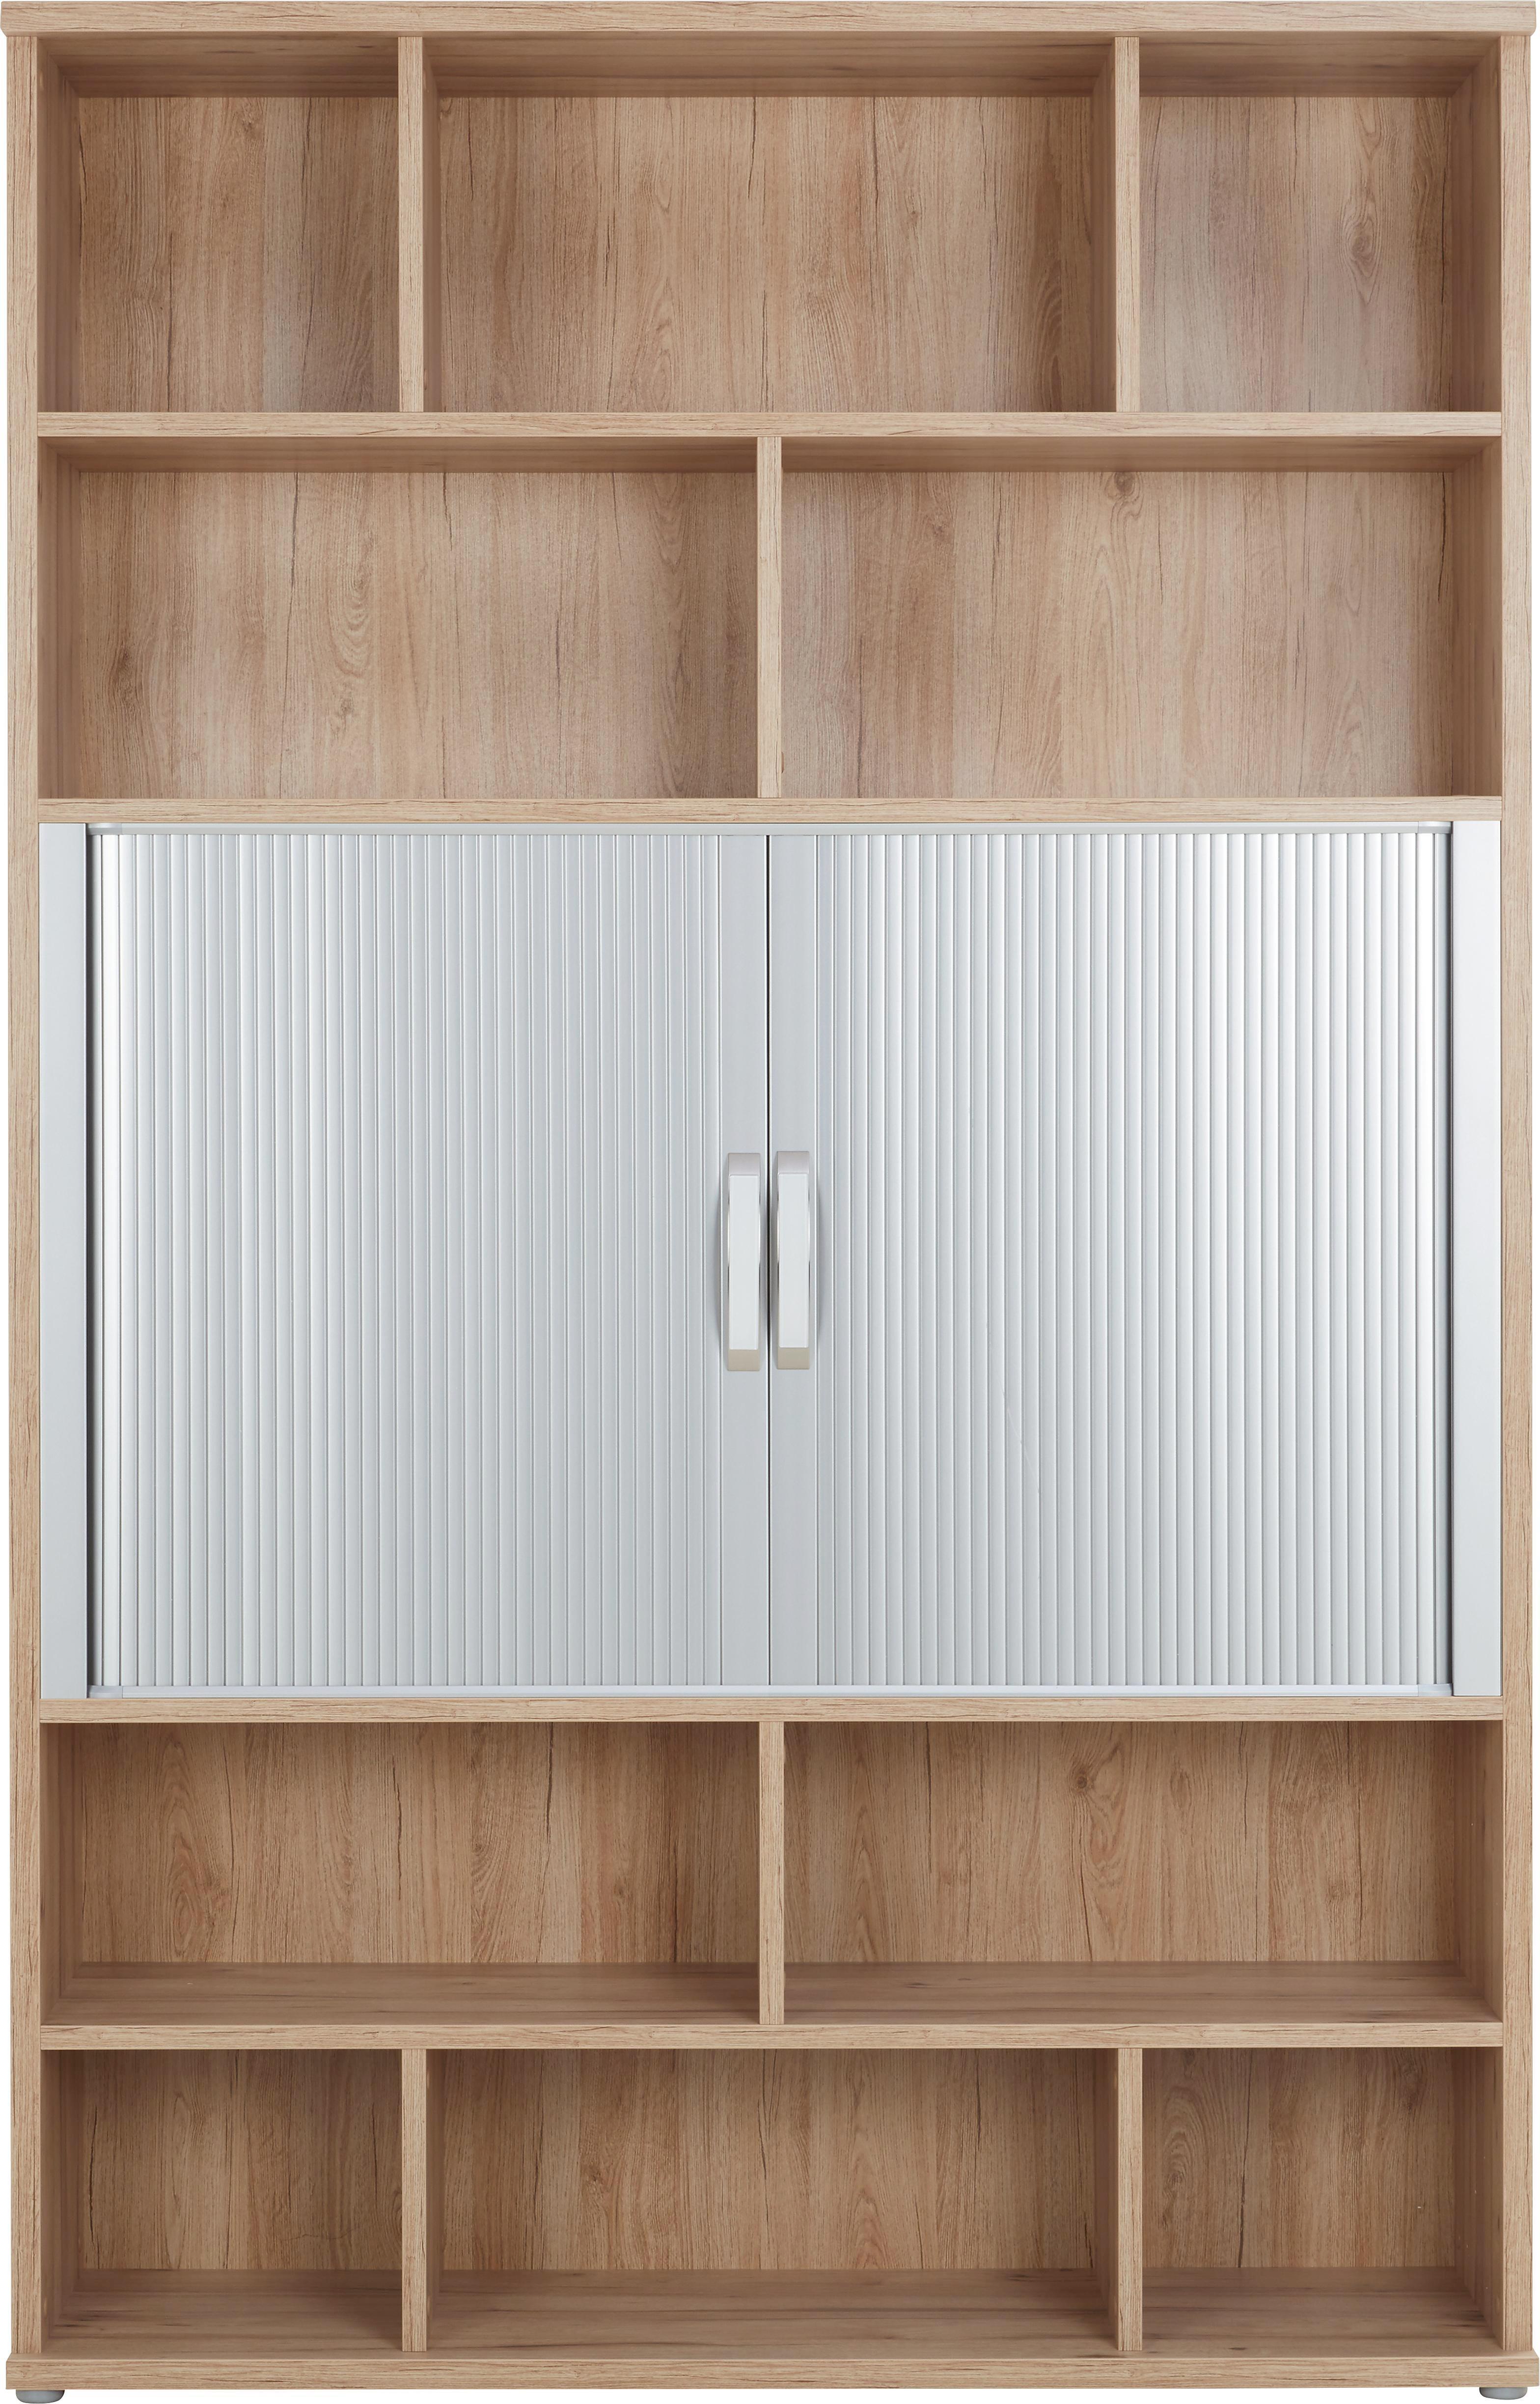 wandregal 40 cm breit beautiful wohnling wandregal liam mit bden hngeregal aus holz kchenregal. Black Bedroom Furniture Sets. Home Design Ideas